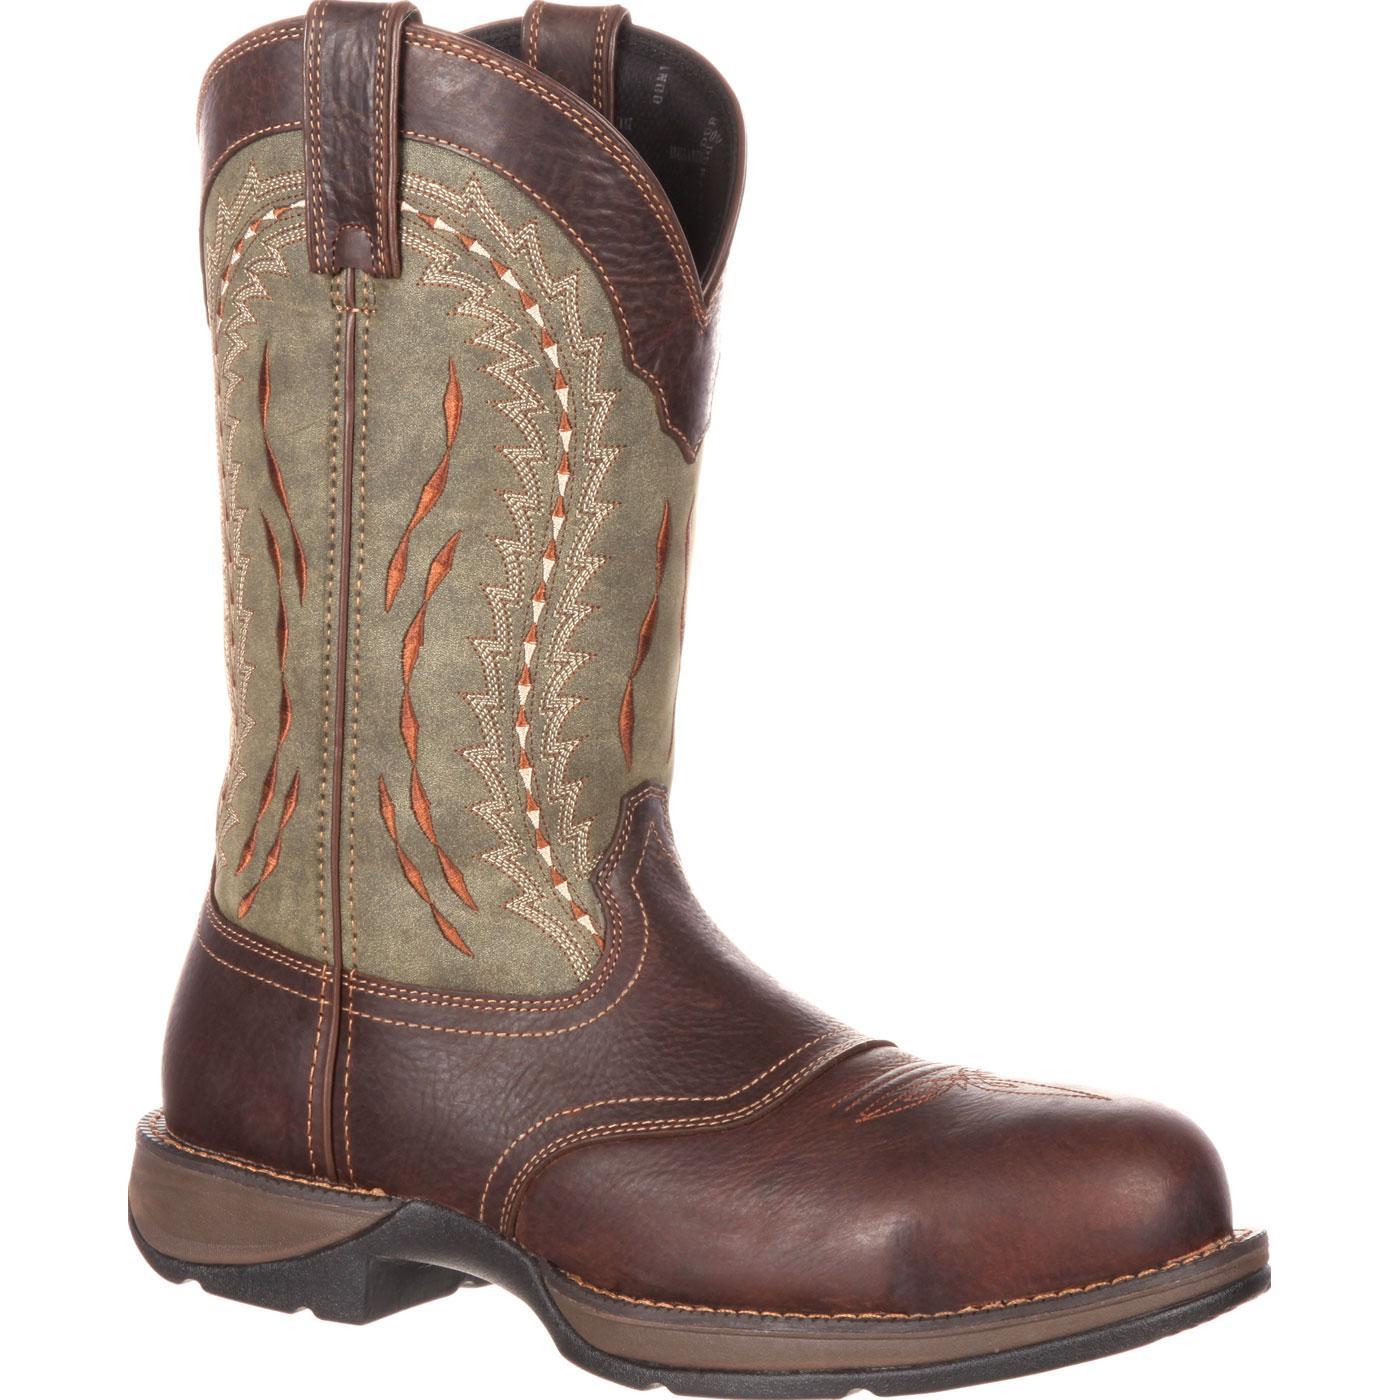 7e02034cb7e Rebel by Durango Composite Toe Saddle Western Boot